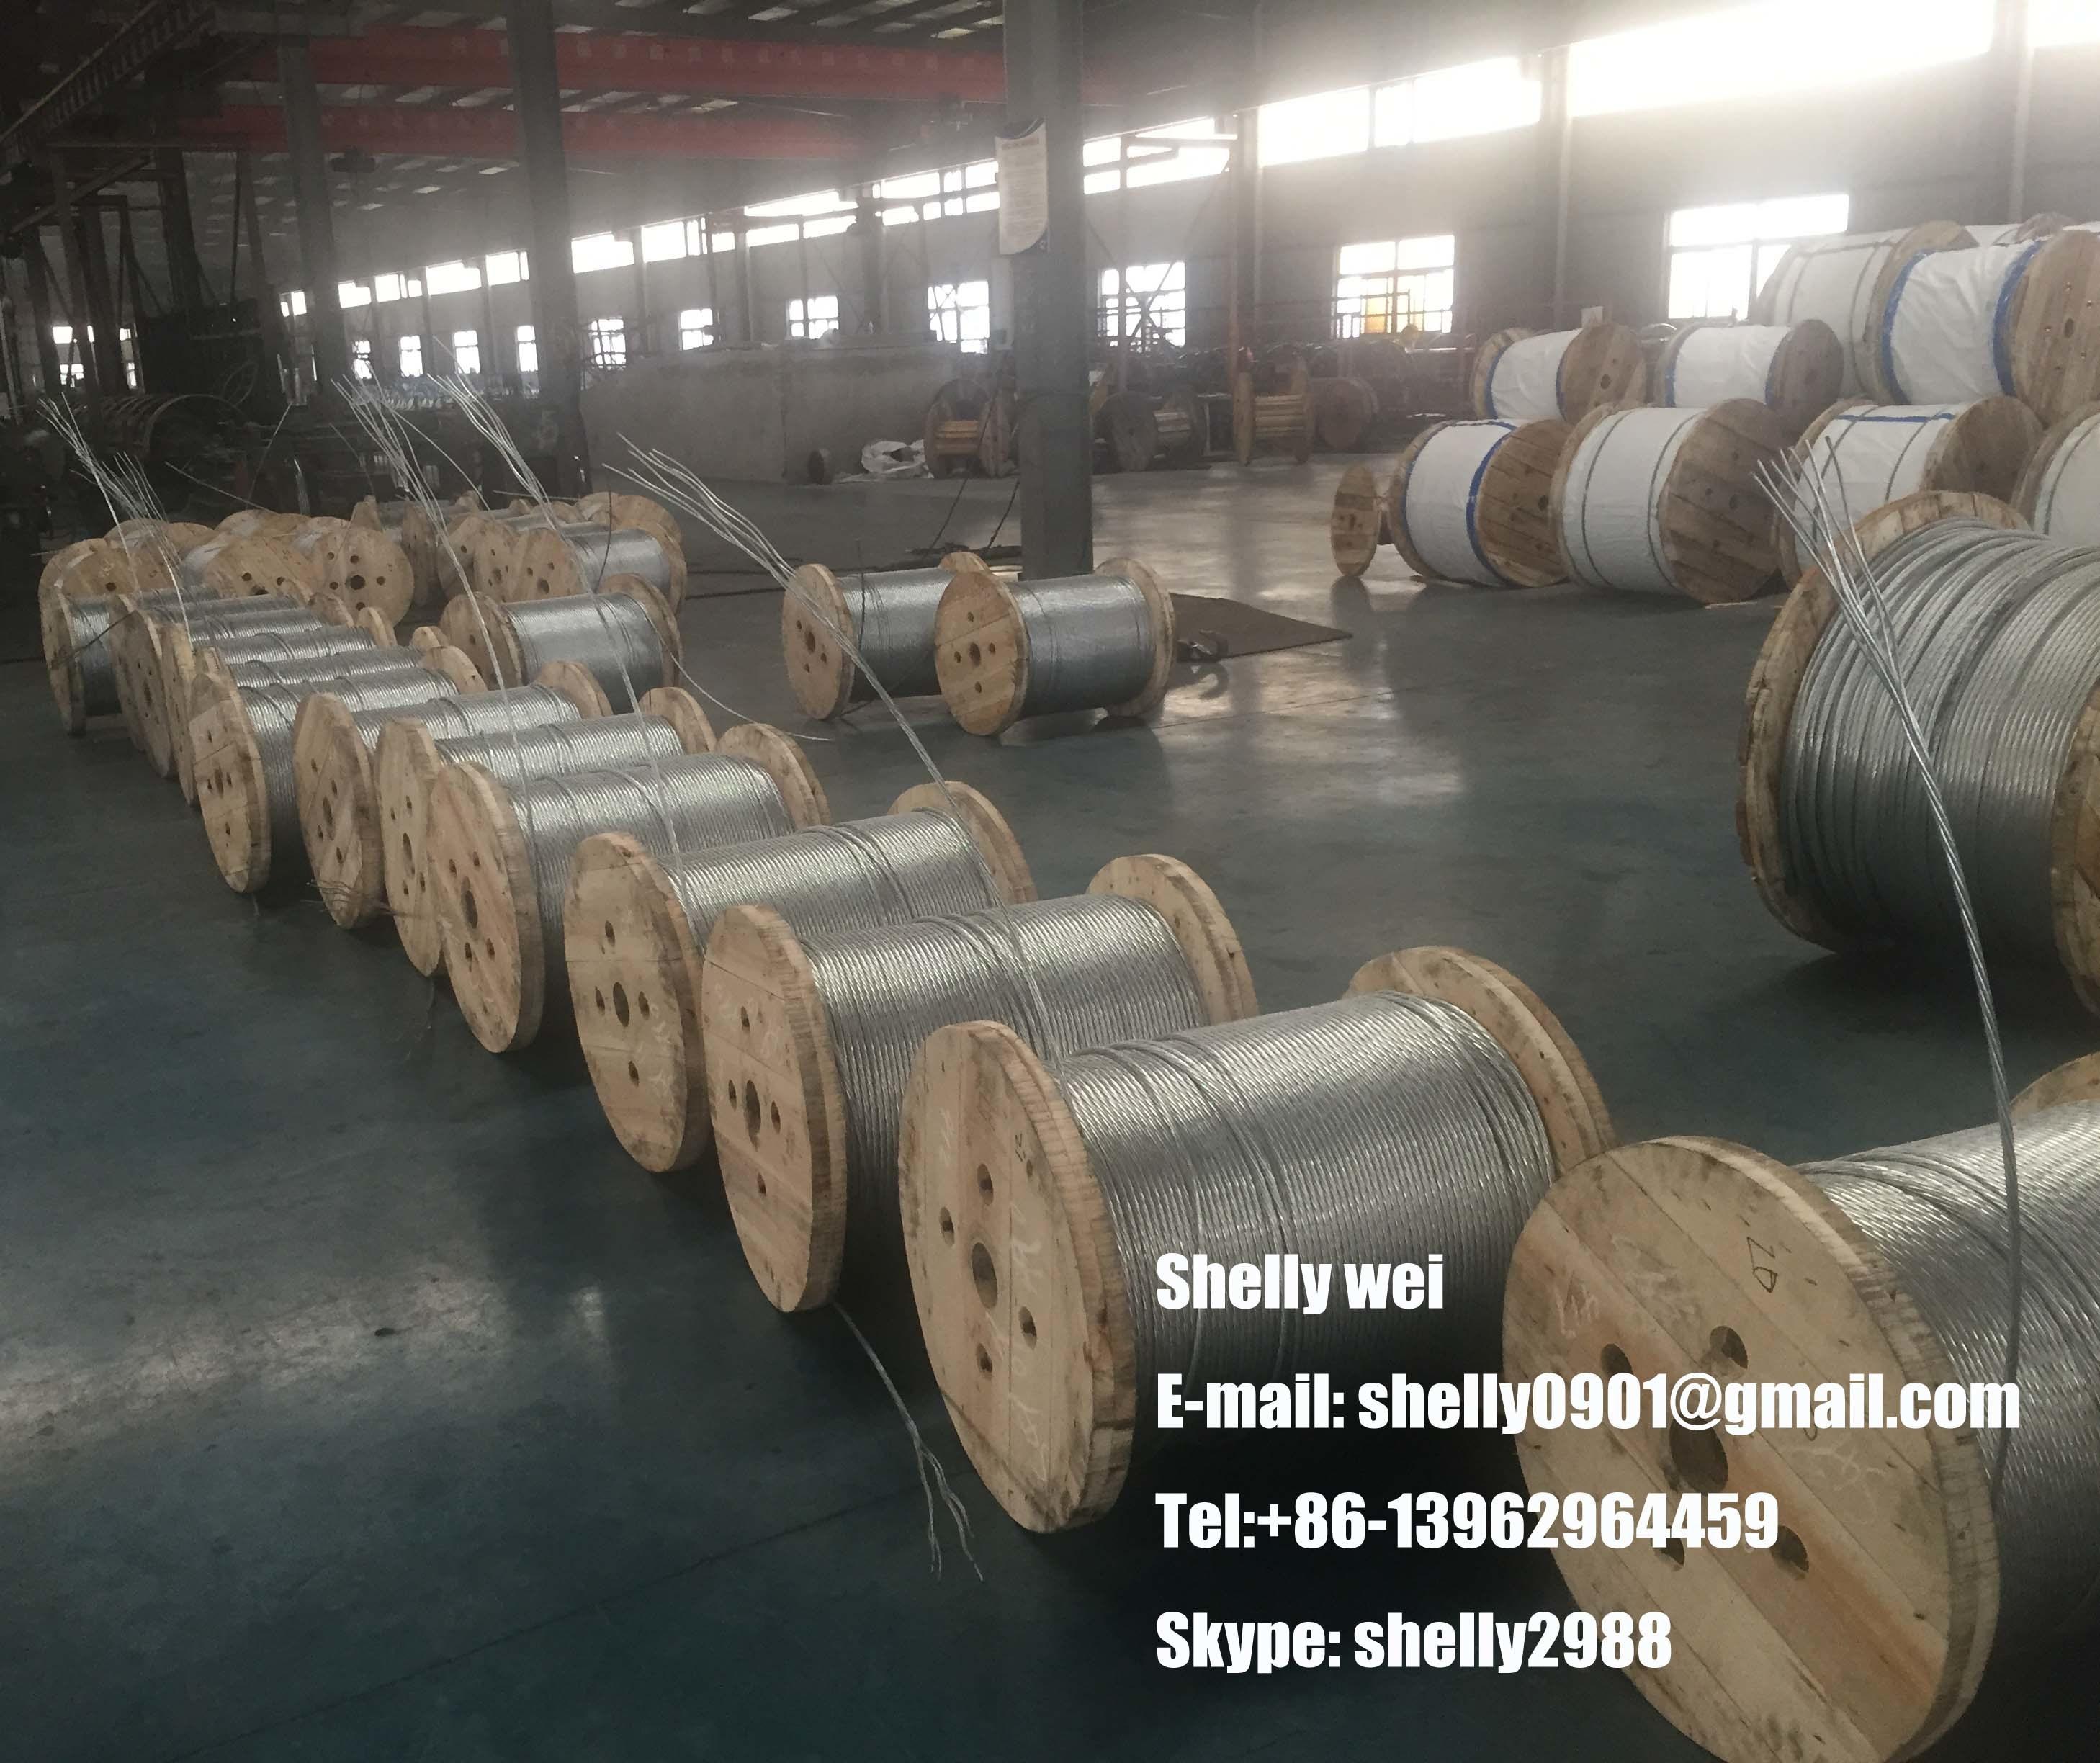 Ehs Galvanized Steel Wire Strand ASTM A475, ASTM a 363, ASTM B498, BS183 BS443, IEC, GB Standard